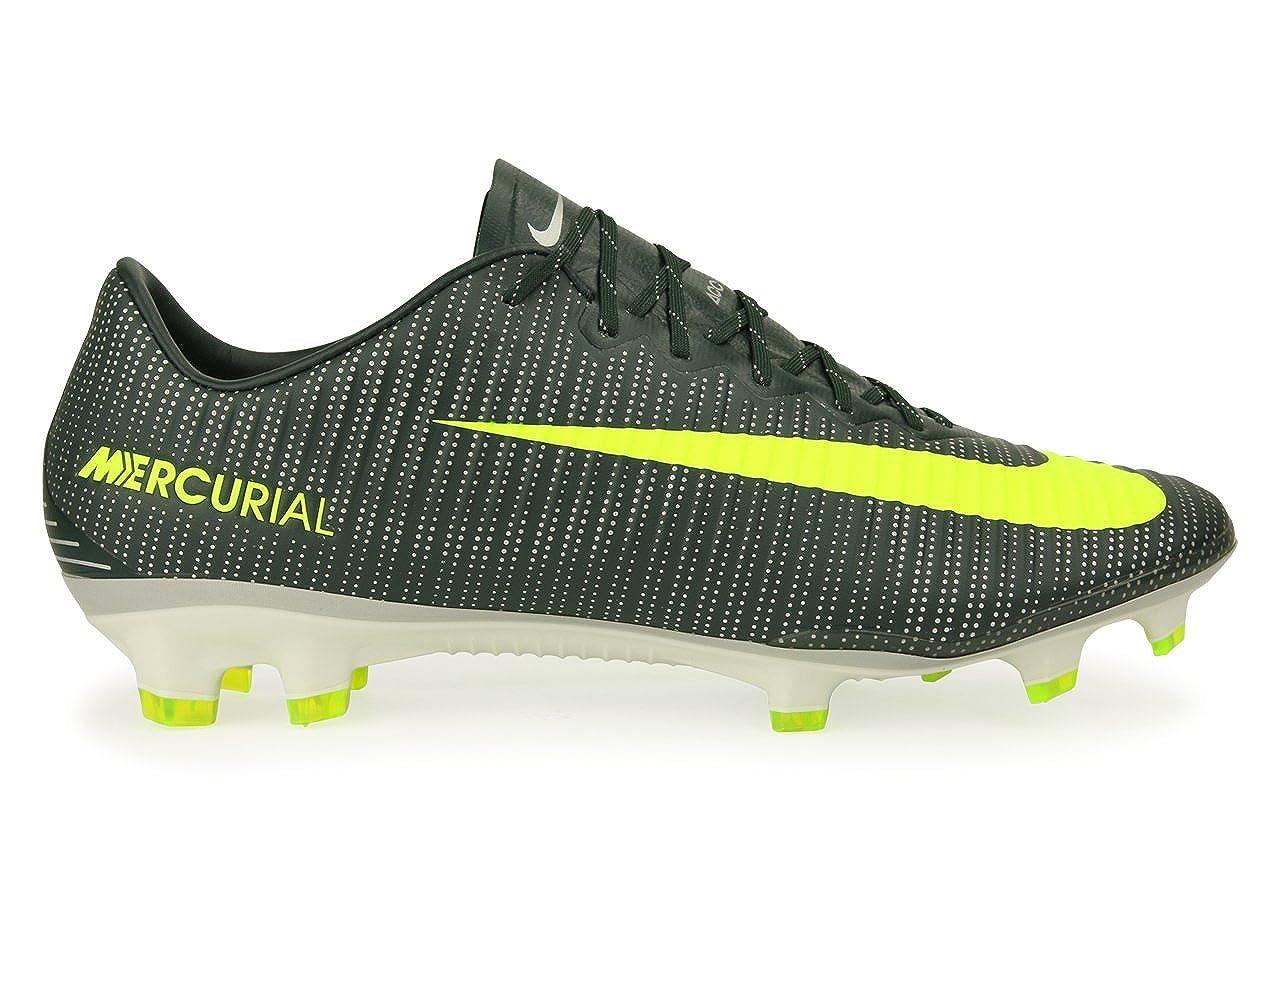 outlet store 94181 31aea Amazon.com | Nike Men's Mercurial Vapor XI CR7 FG Seaweed ...